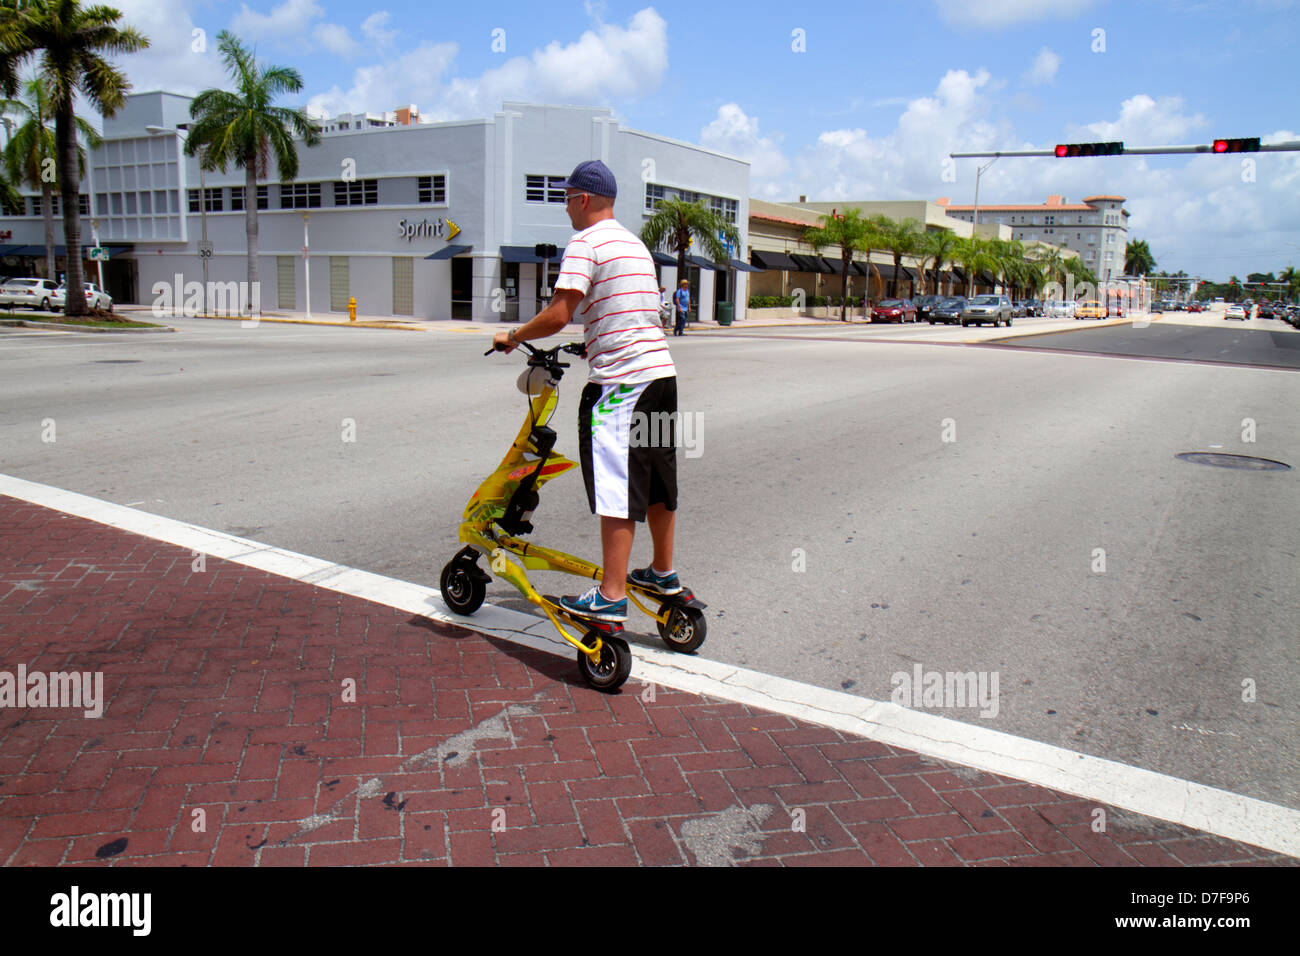 Miami Beach Florida Alton Road Tribred by Trikke electric vehicle rented rental Hispanic man riding traffic intersection - Stock Image